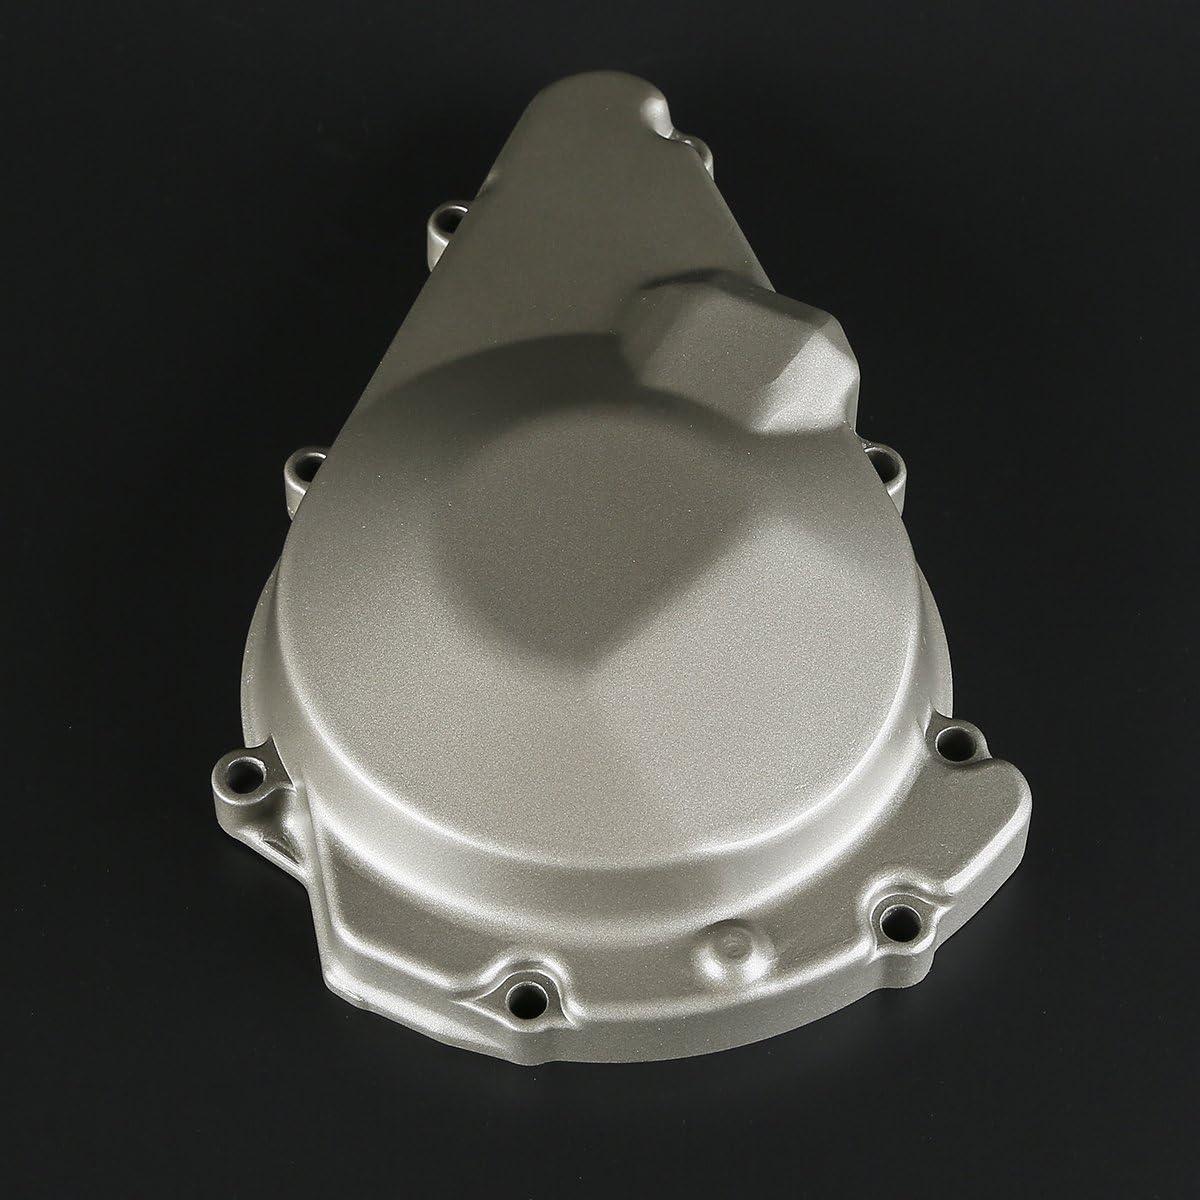 XMT-MOTO Aluminum Engine Stator Cover Crankcase fits for Suzuki GSX400 GK75A GK76A//GK78A RF400,GSF400 Bandit 400